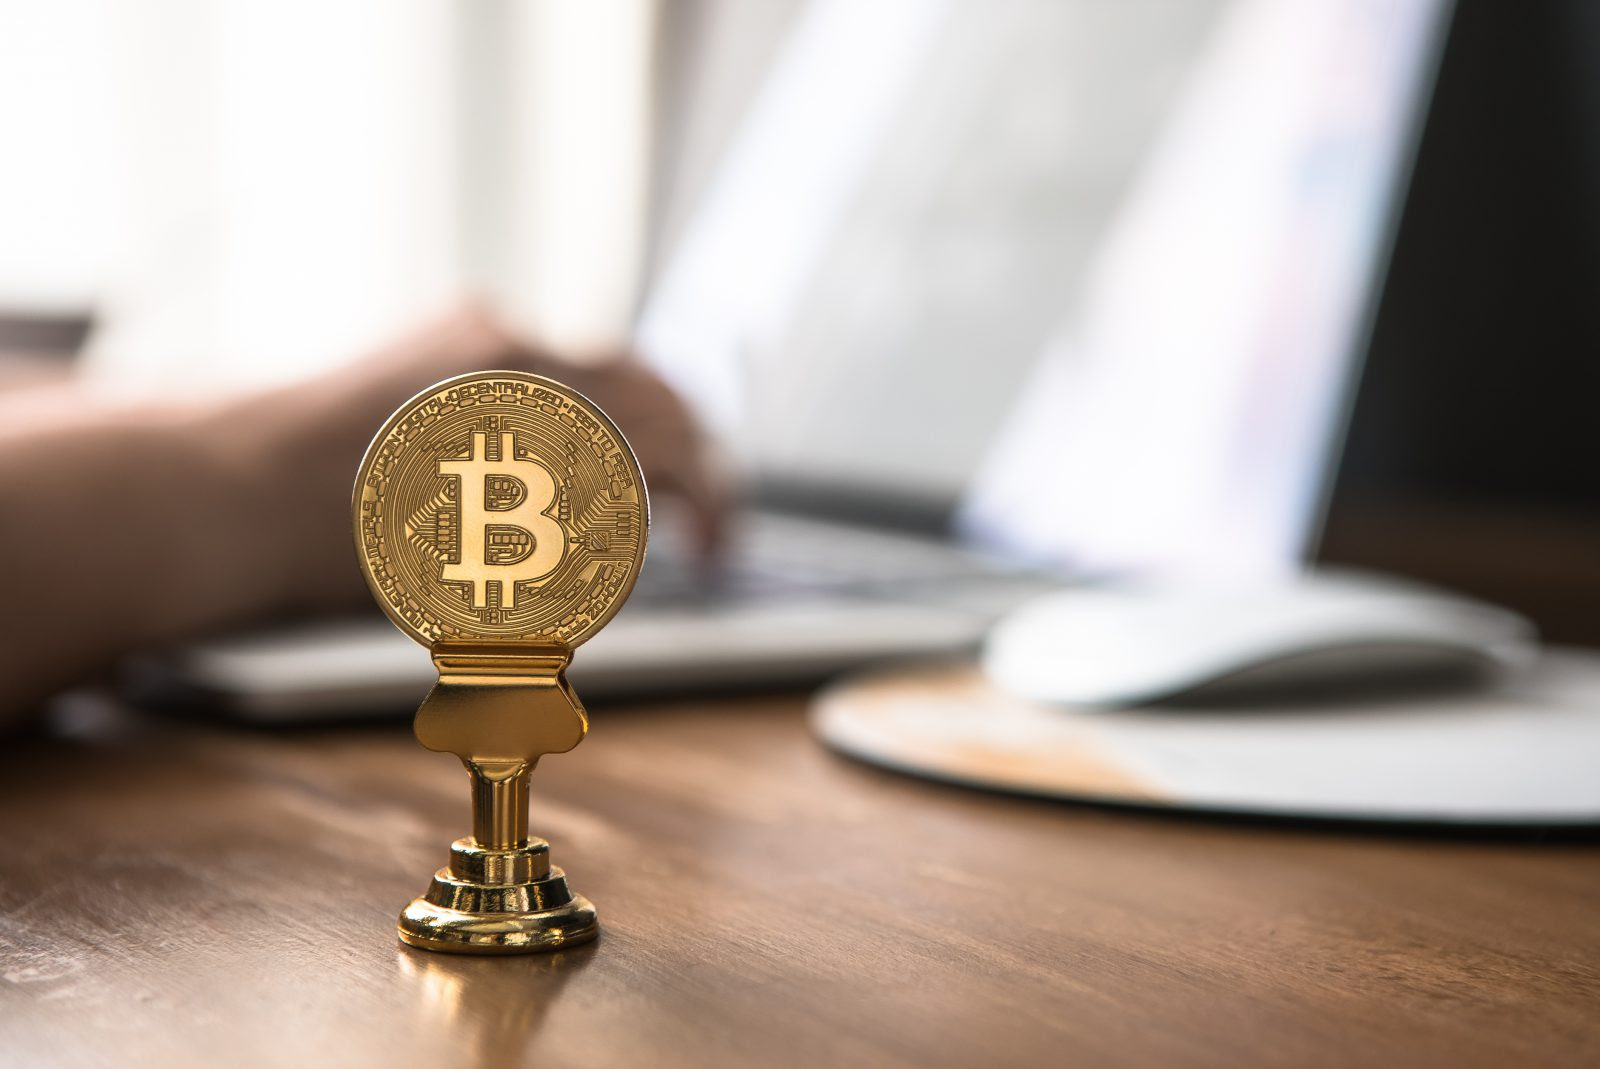 Crypto lunch: prijs Bitcoin & crypto stijgt. ETH kritiek, Elon Musk afgetroefd